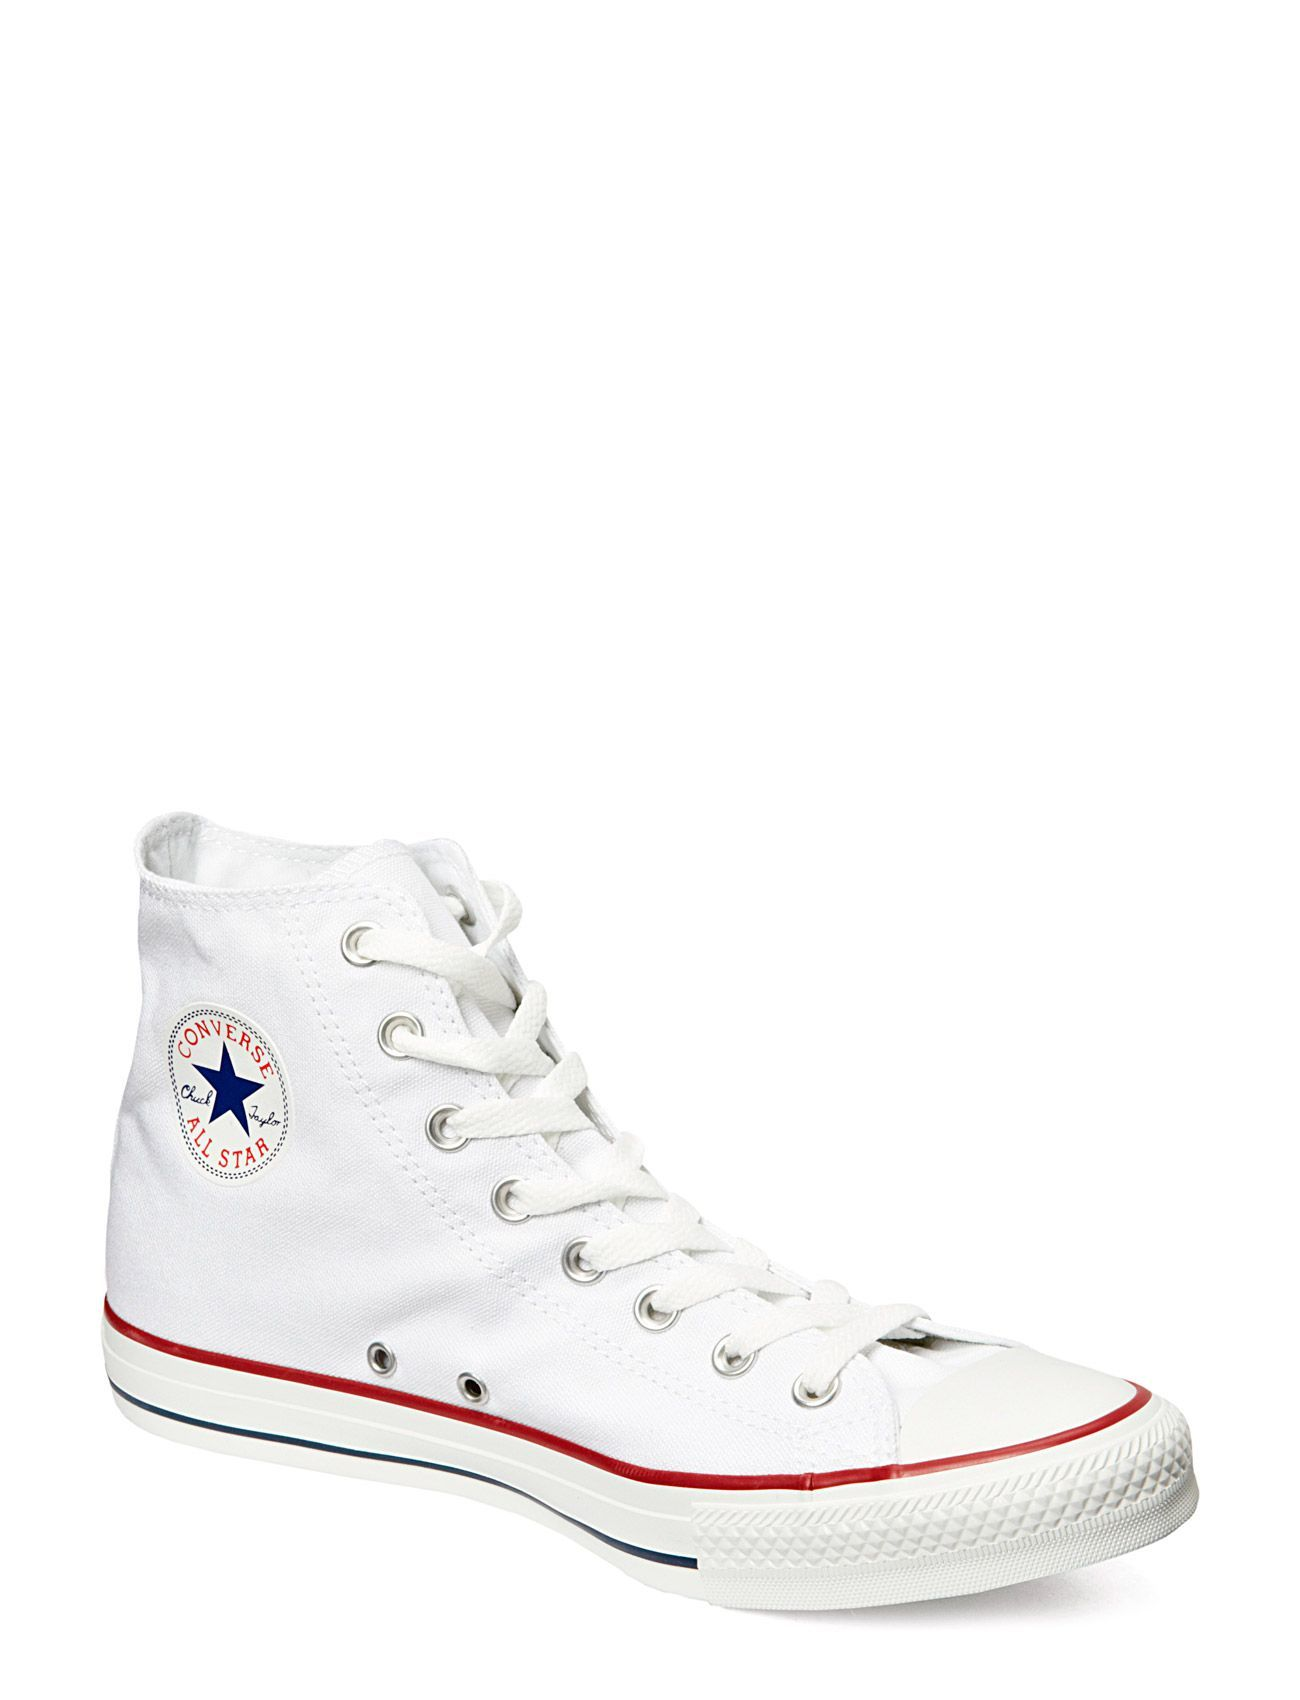 All Star Canvas Hi Converse Sneakers til Kvinder i